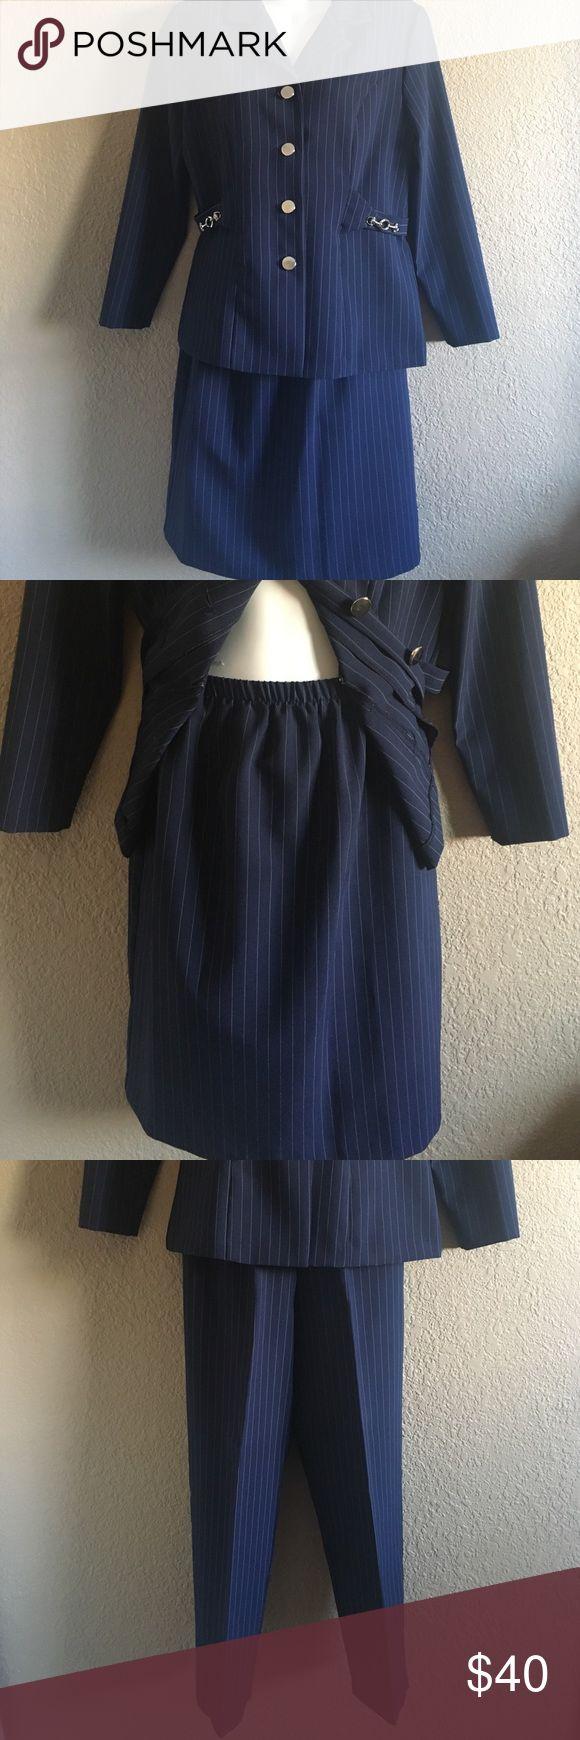 3pc suit set feminine - flattering Navy blue striped 3pc suit set , used condition, great condition, ( smoke free home ) Skirts Pencil